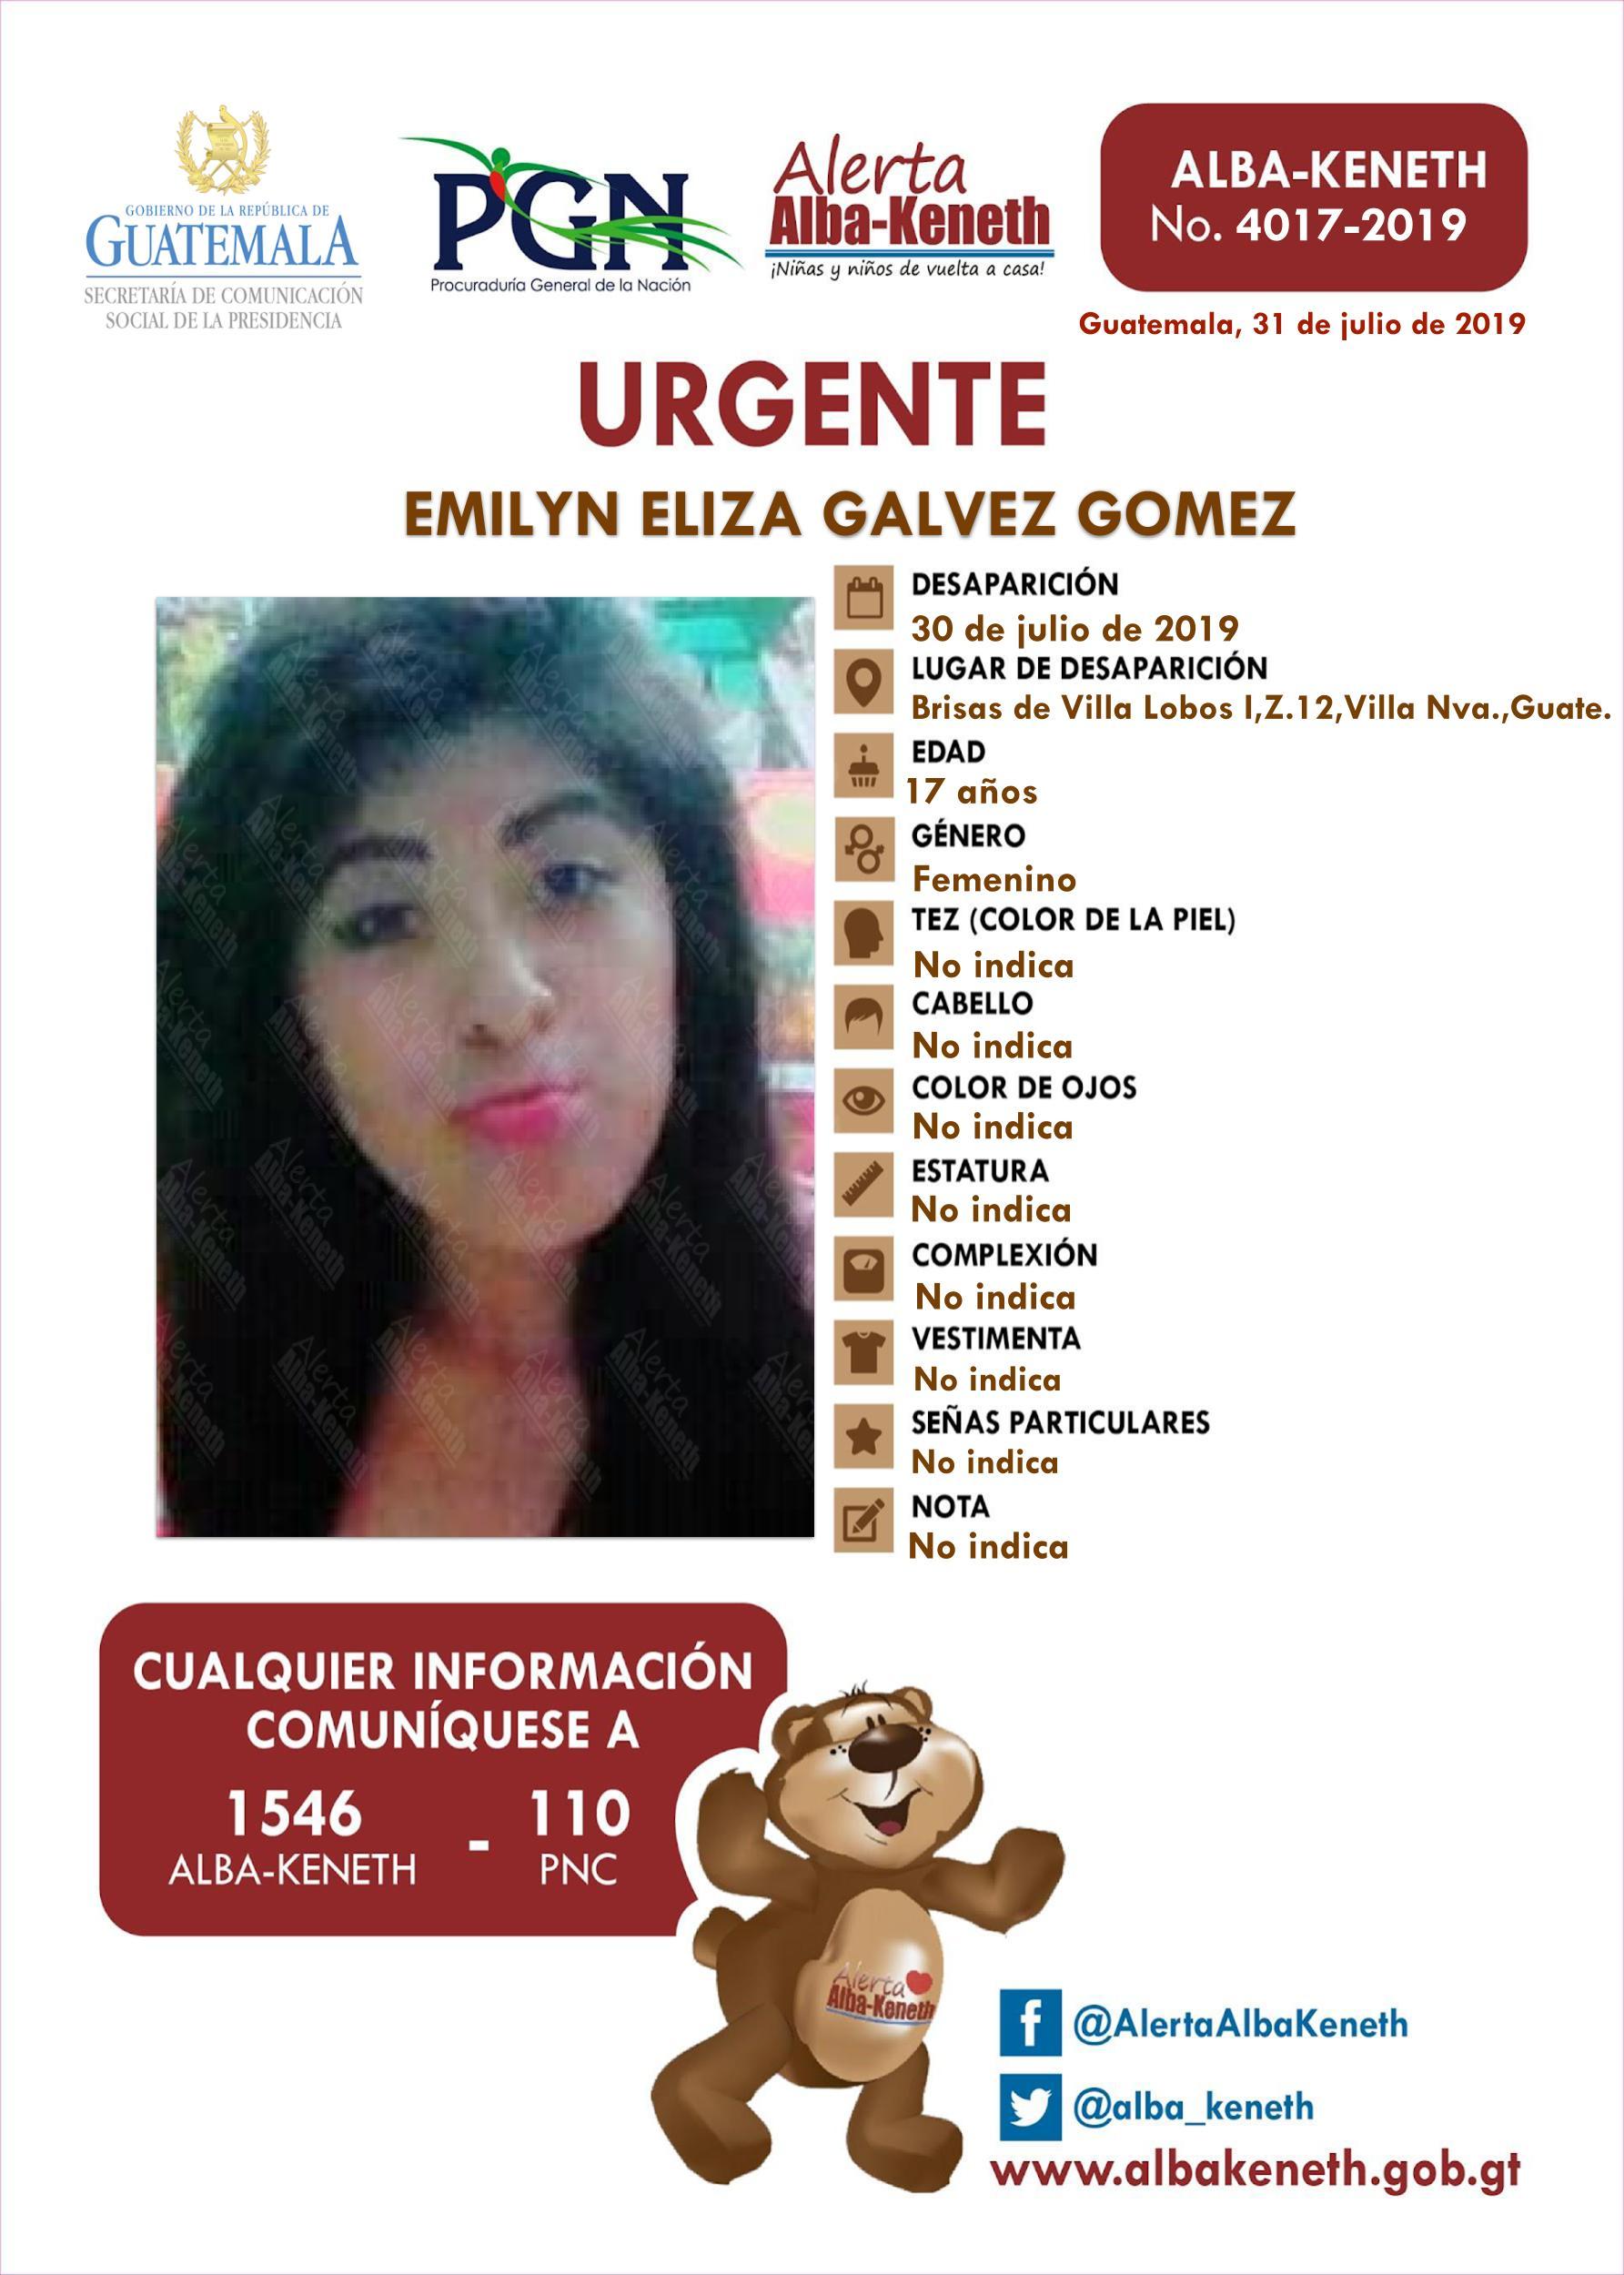 Emilyn Eliza Galvez Gomez